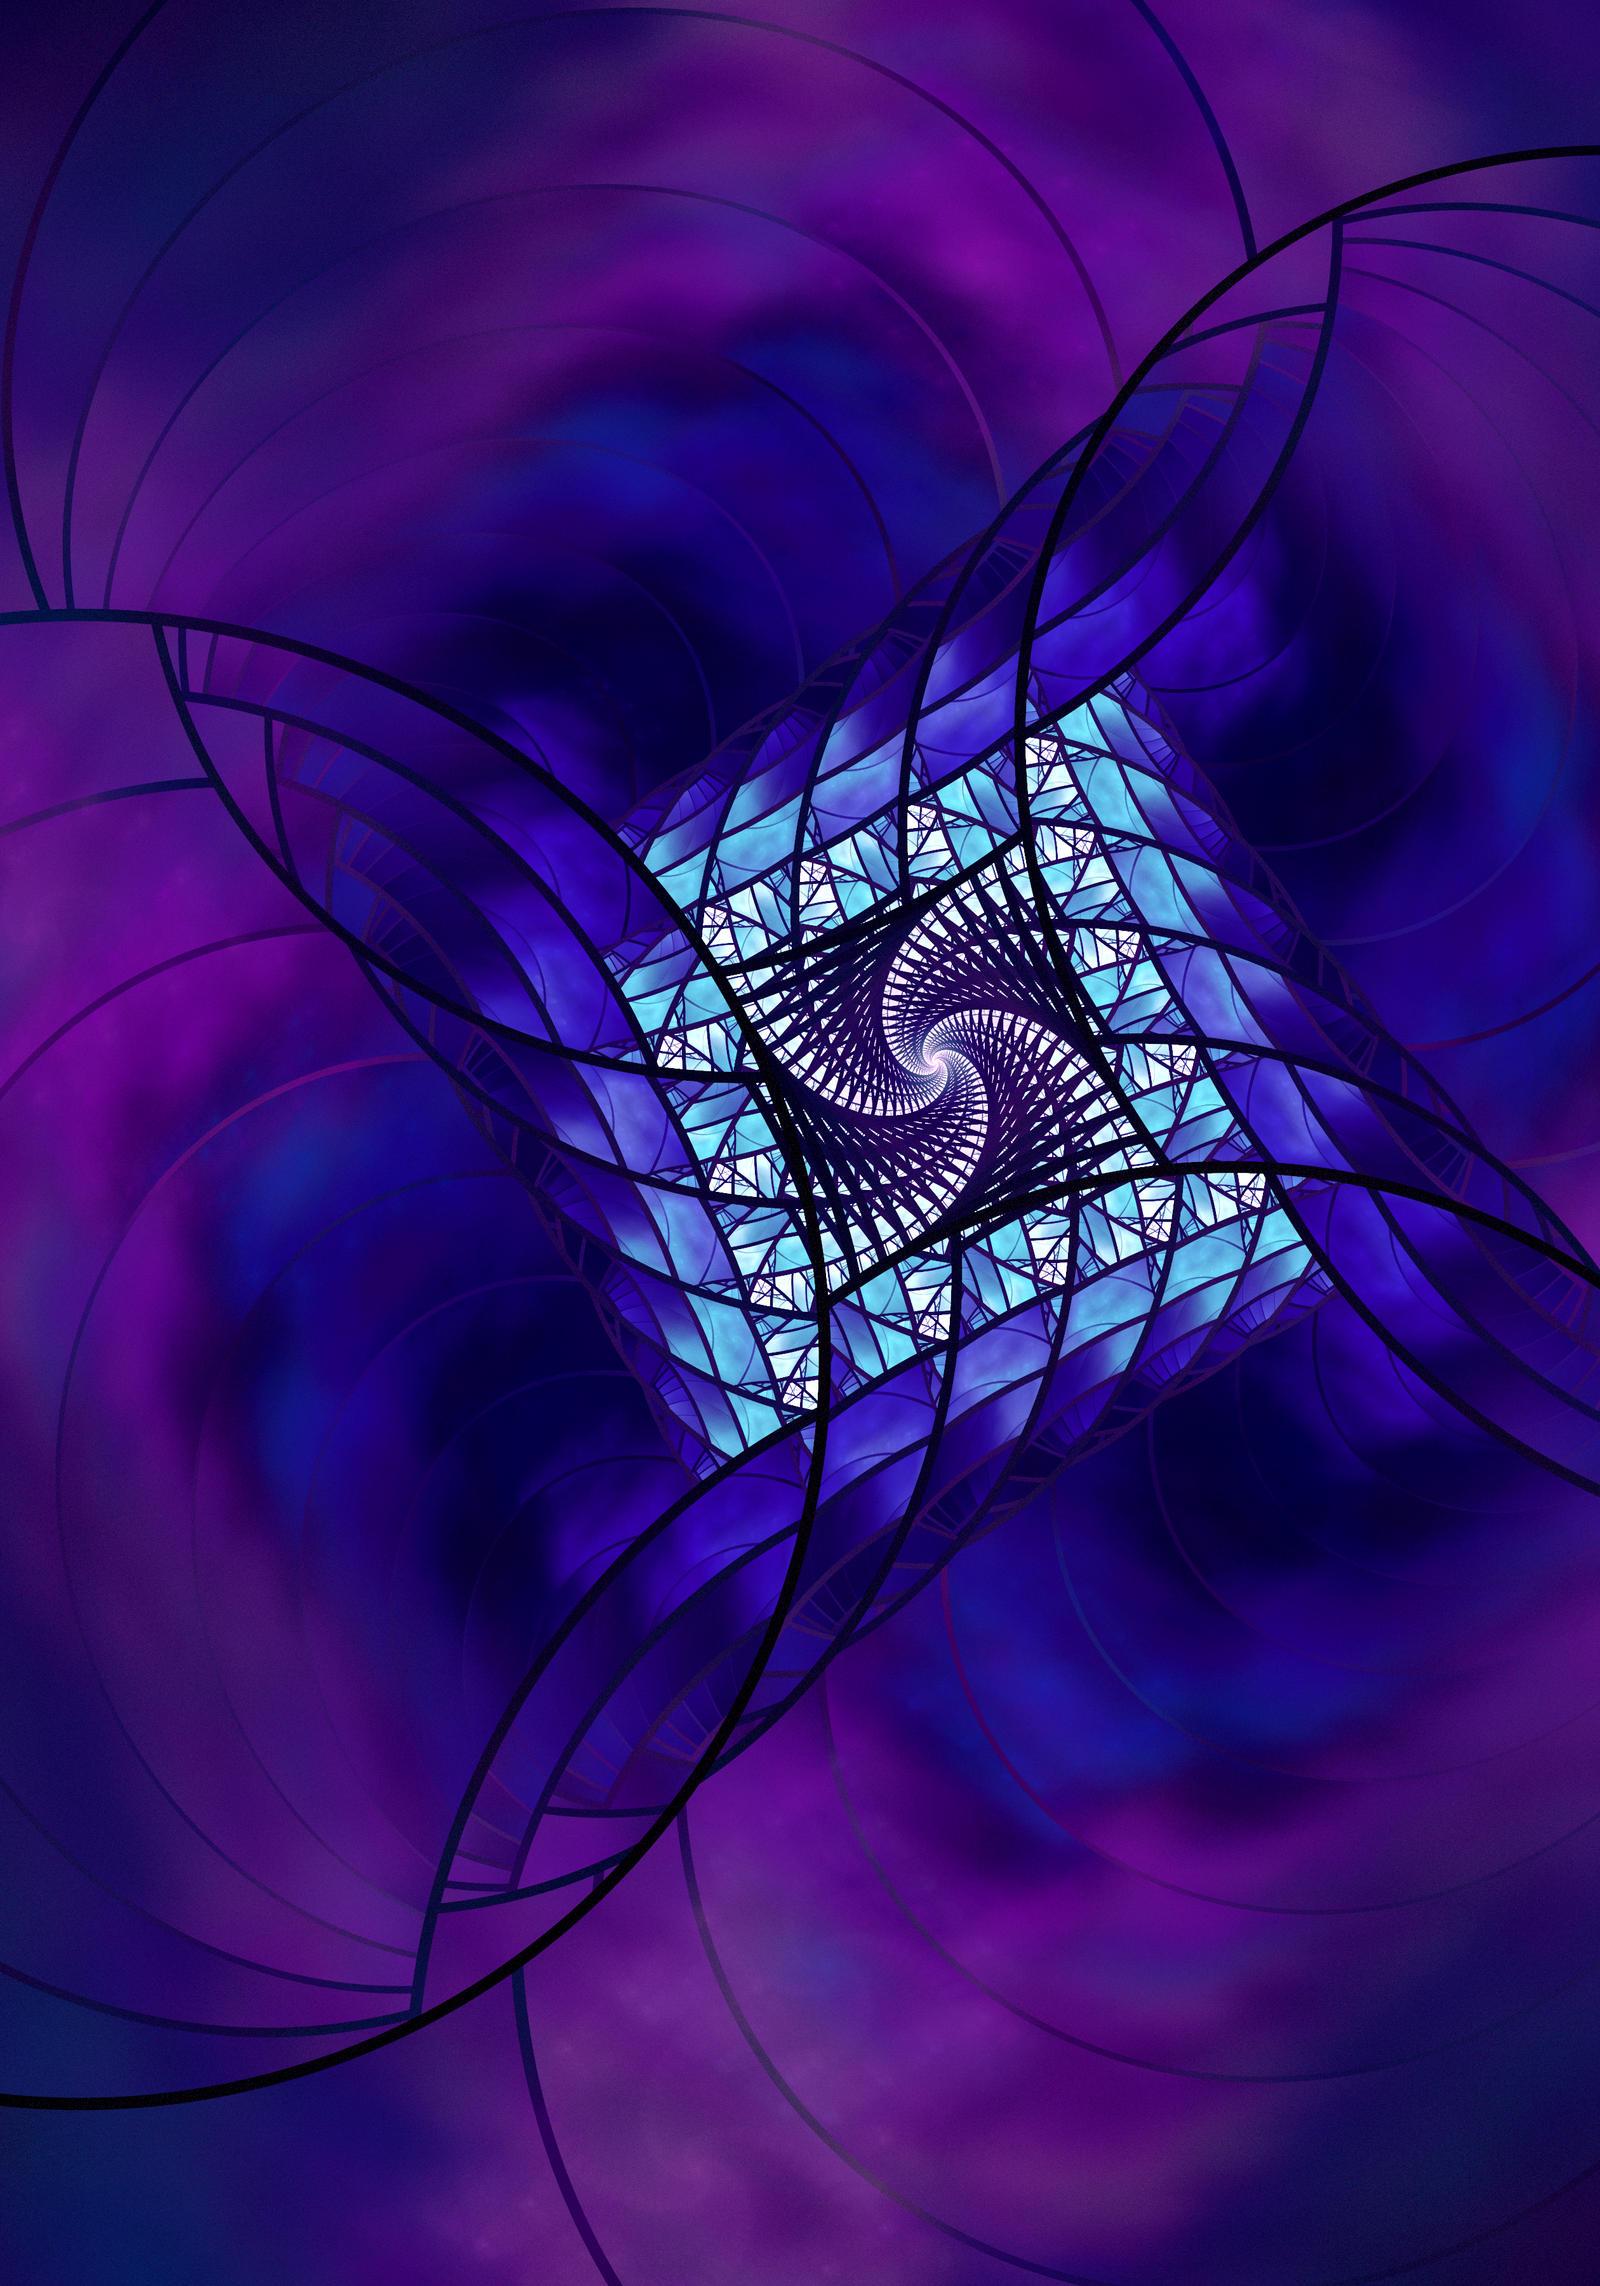 Purple Haze by DeepChrome